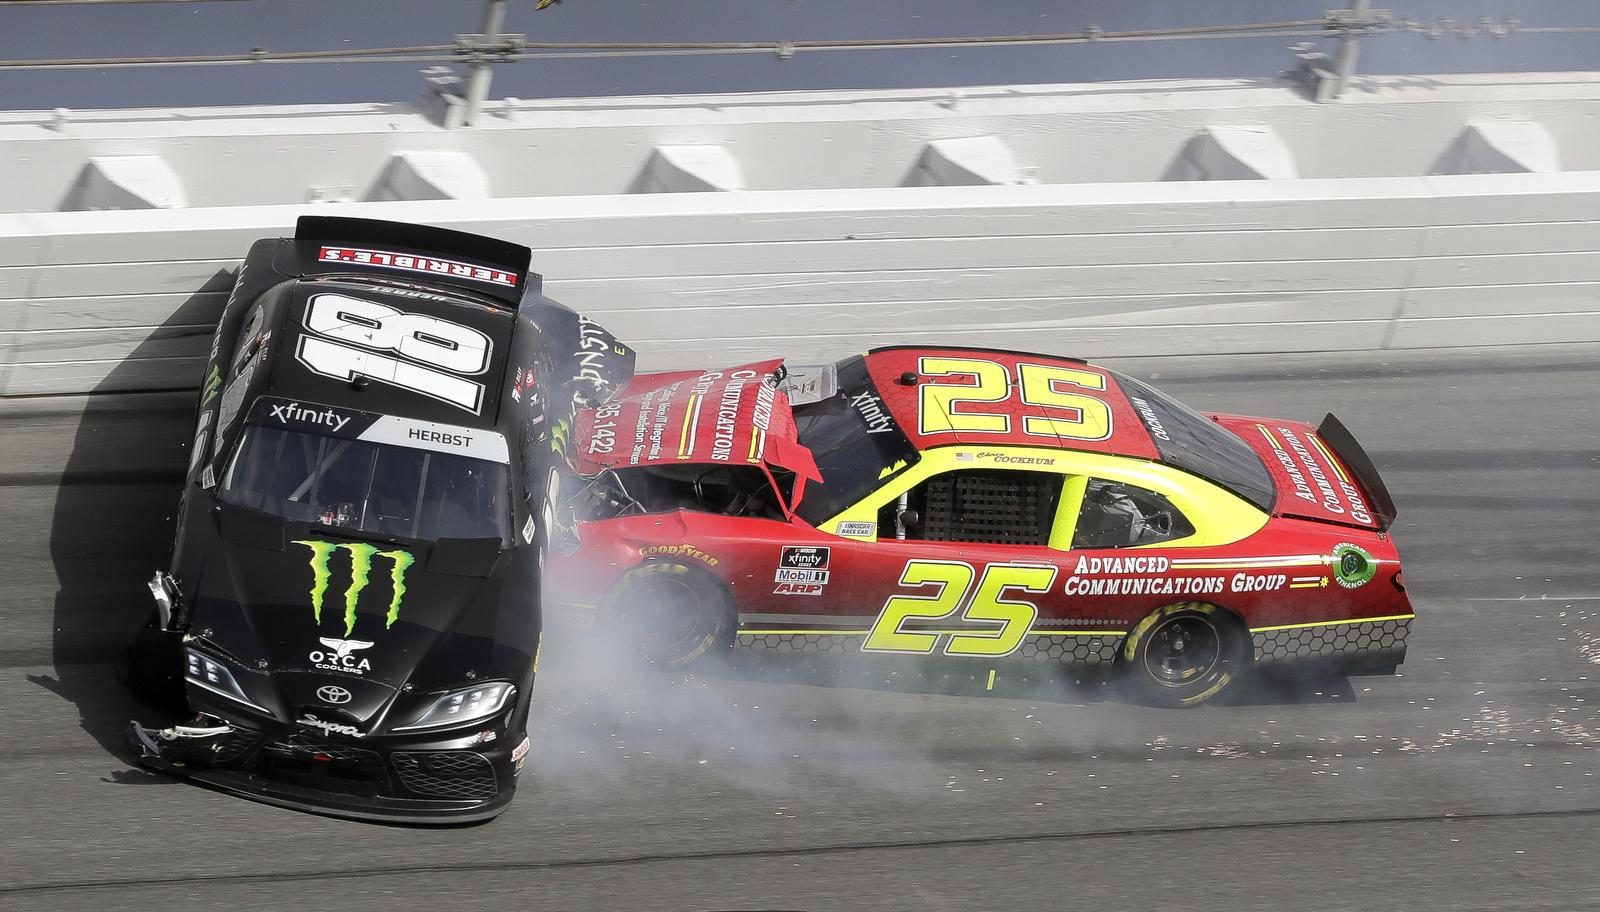 Riley Herbst (18) and Chris Cockrum (25) crash in Turn 3 during the NASCAR Xfinity auto race at Daytona International Speedway, Saturday, Feb. 15, 2020, in Daytona Beach, Fla. AP